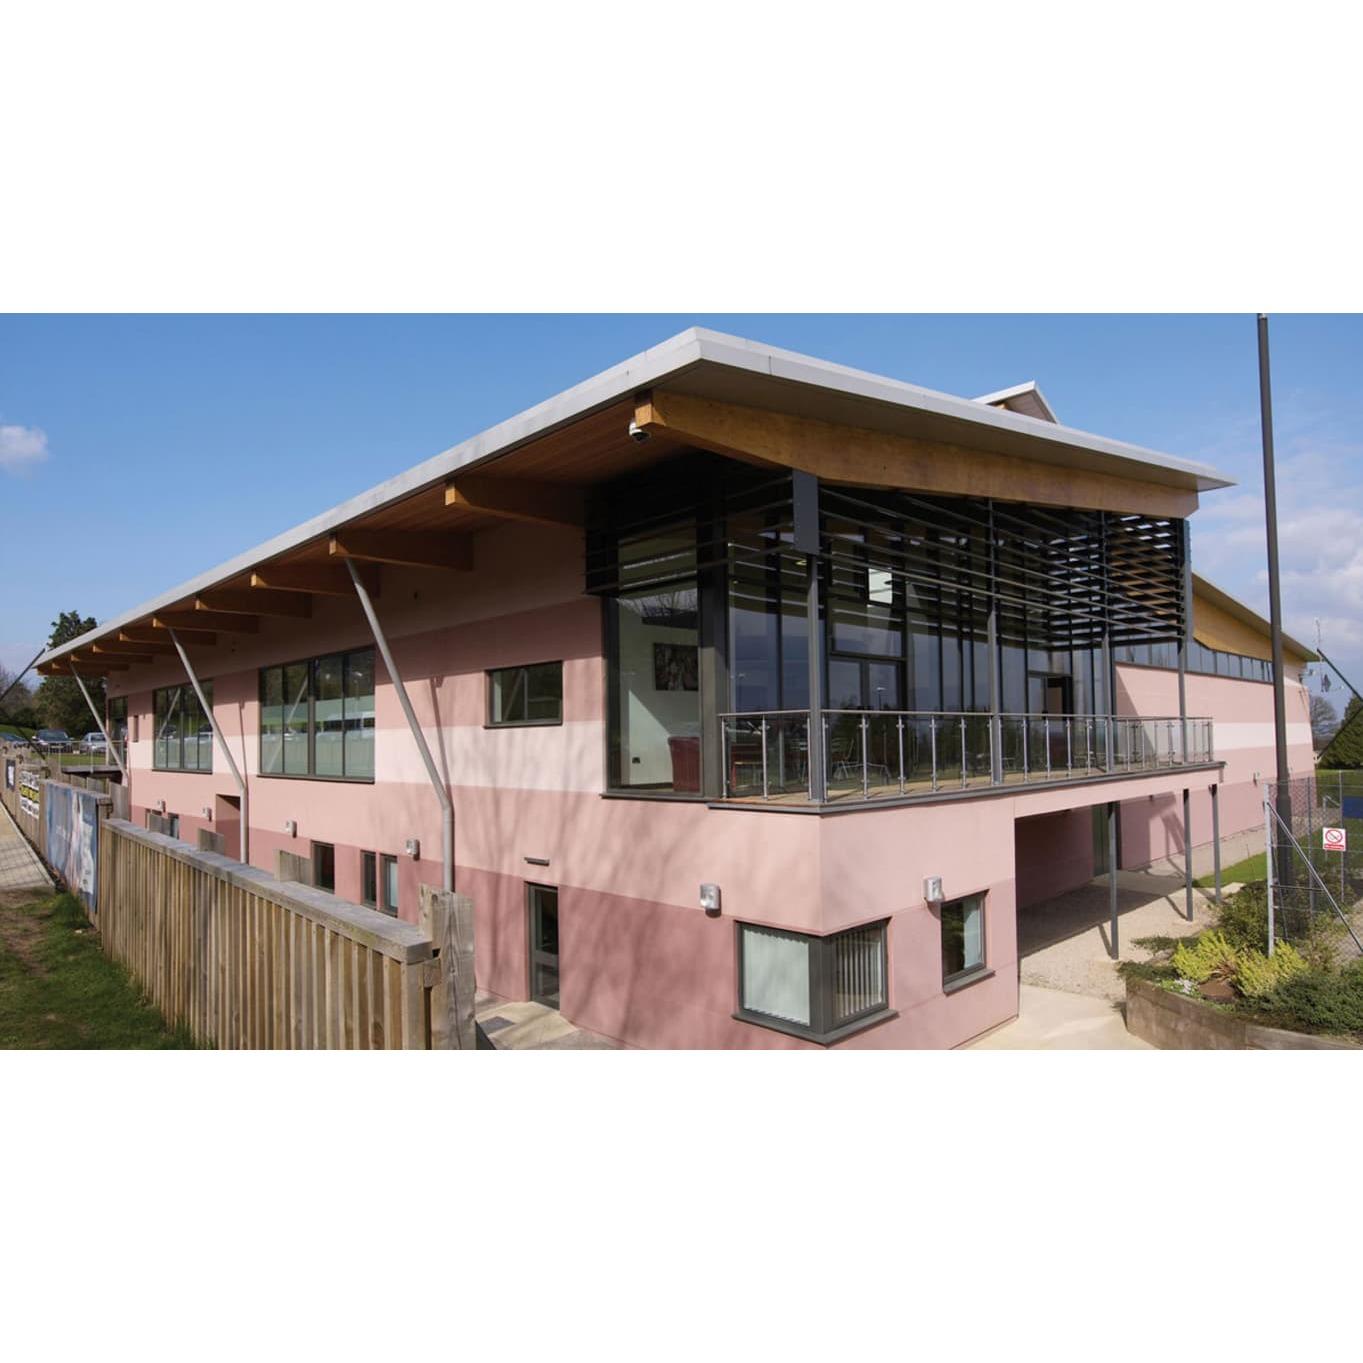 MSJ Sports & Fitness Centre - Malvern, Worcestershire WR14 3LH - 01684 584638 | ShowMeLocal.com